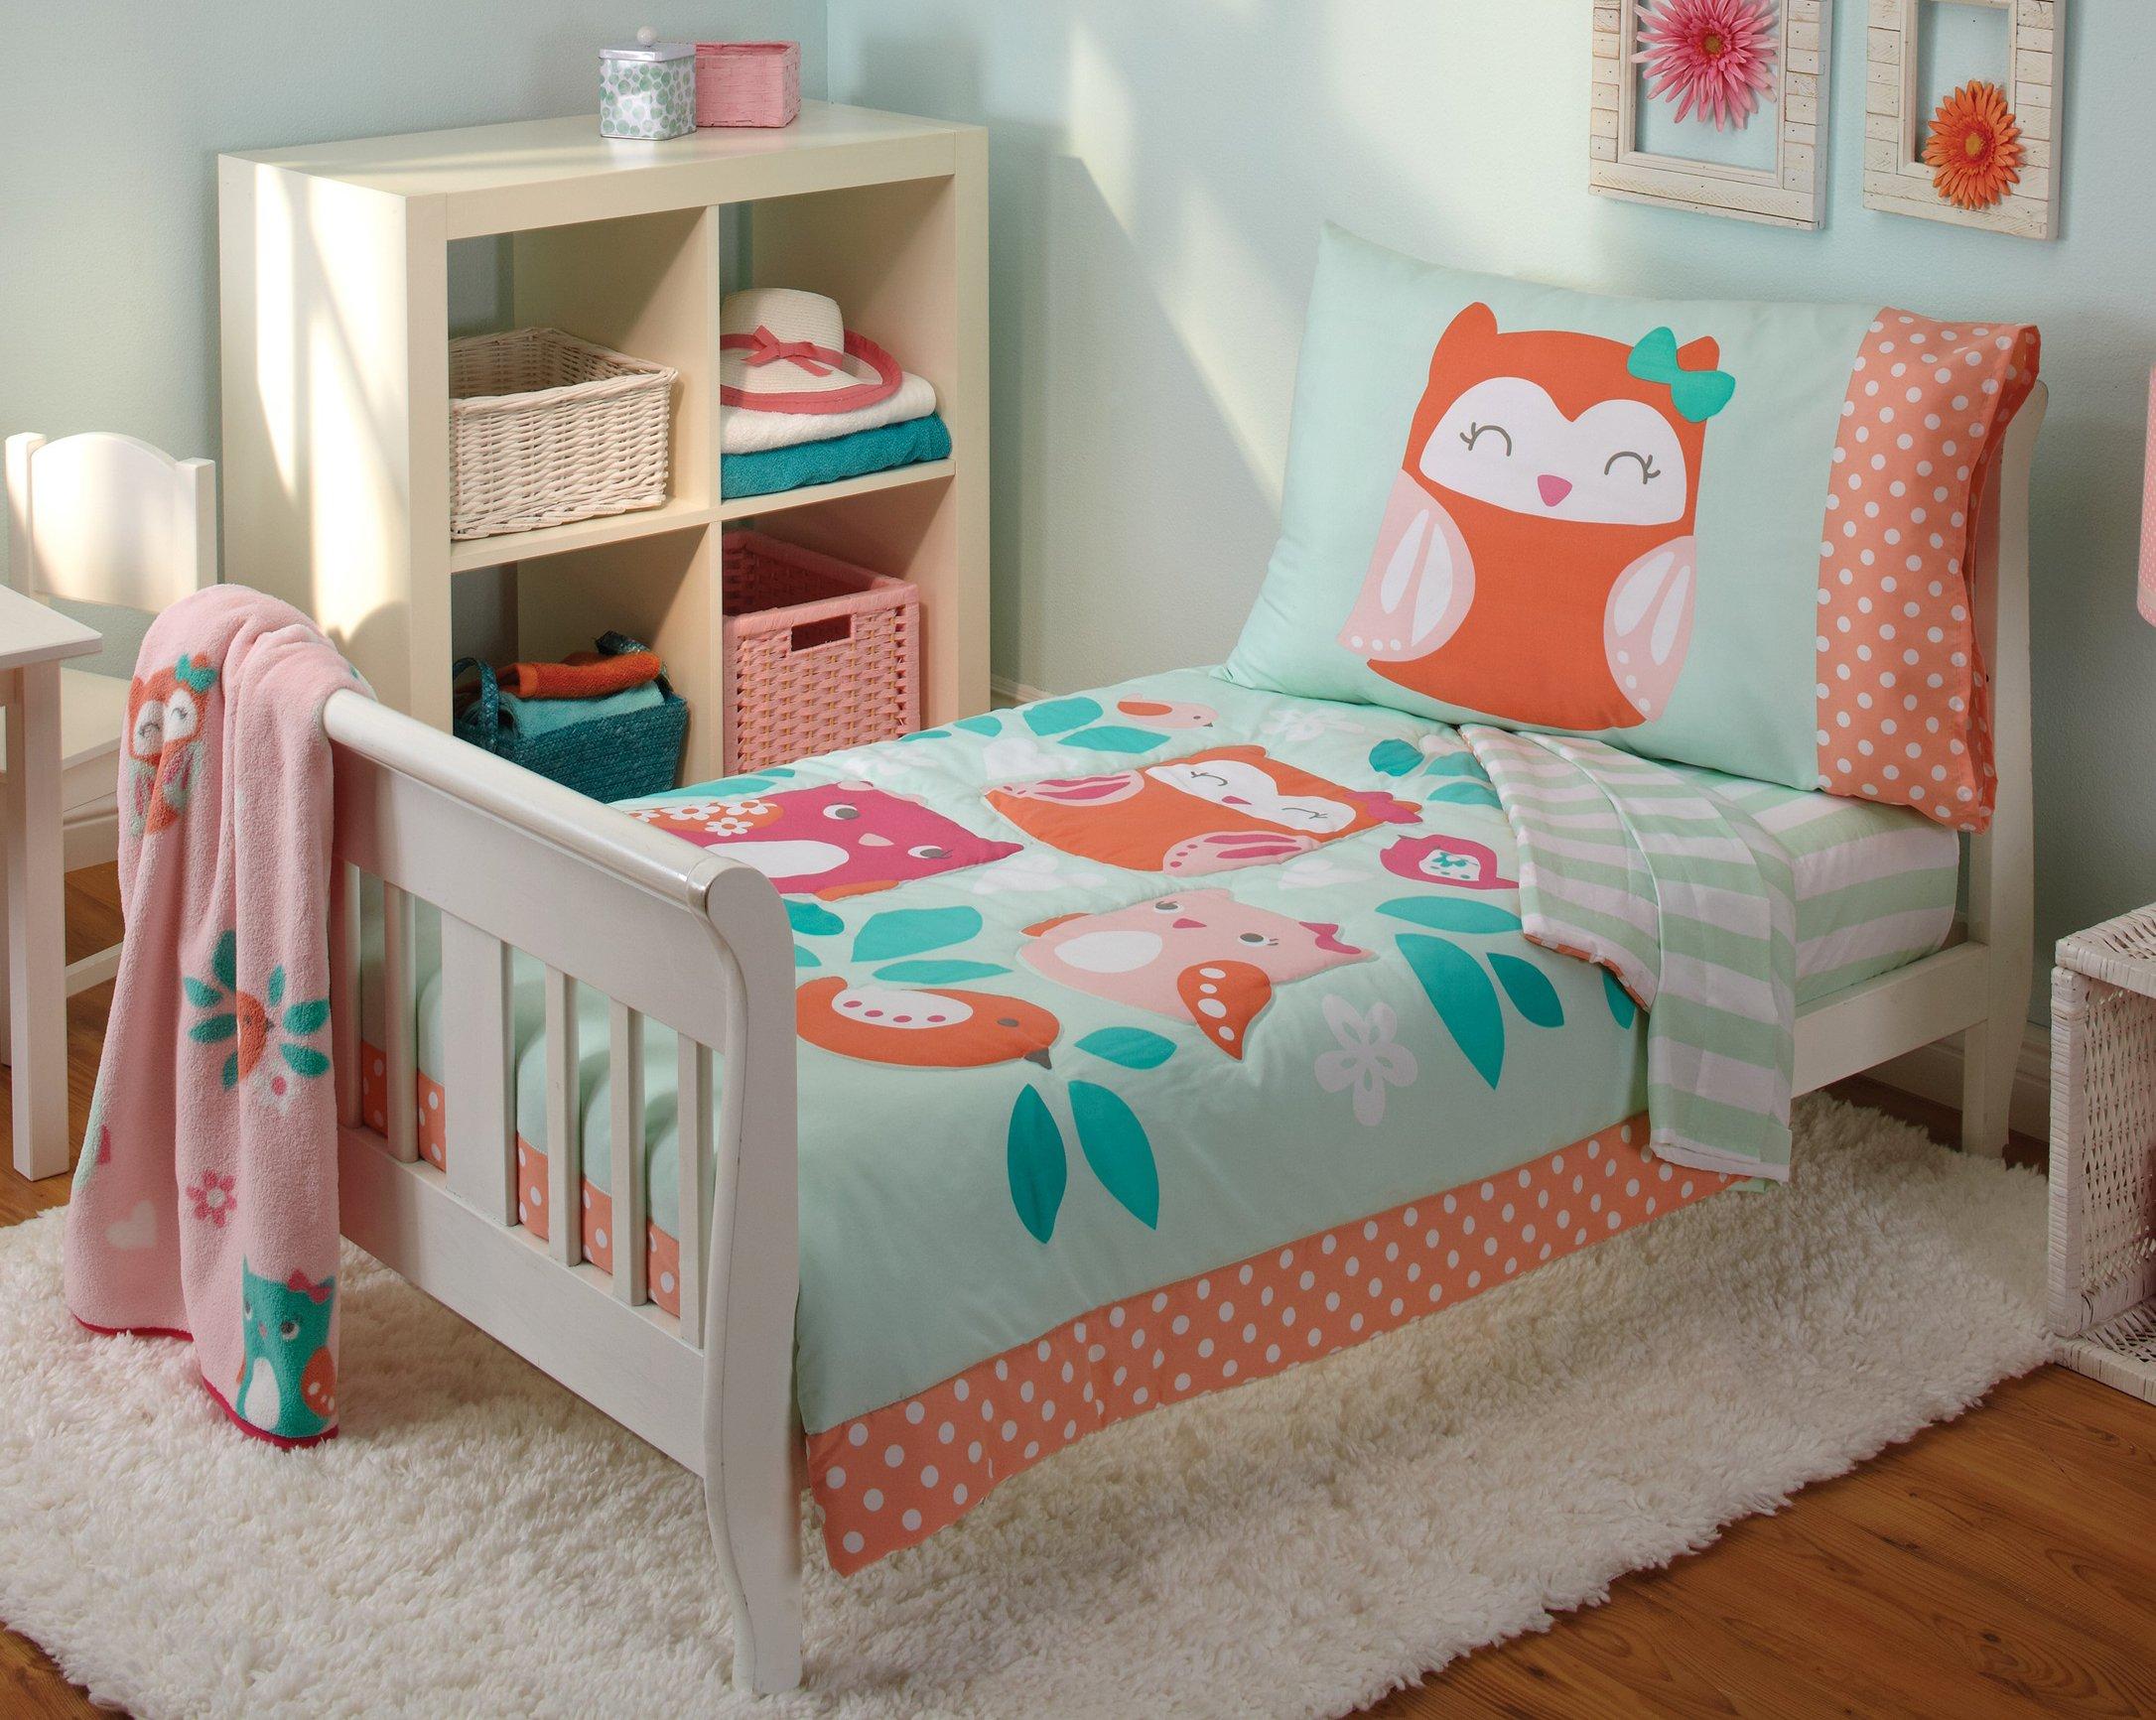 Carter's Too Cute To Hoot Toddler Set